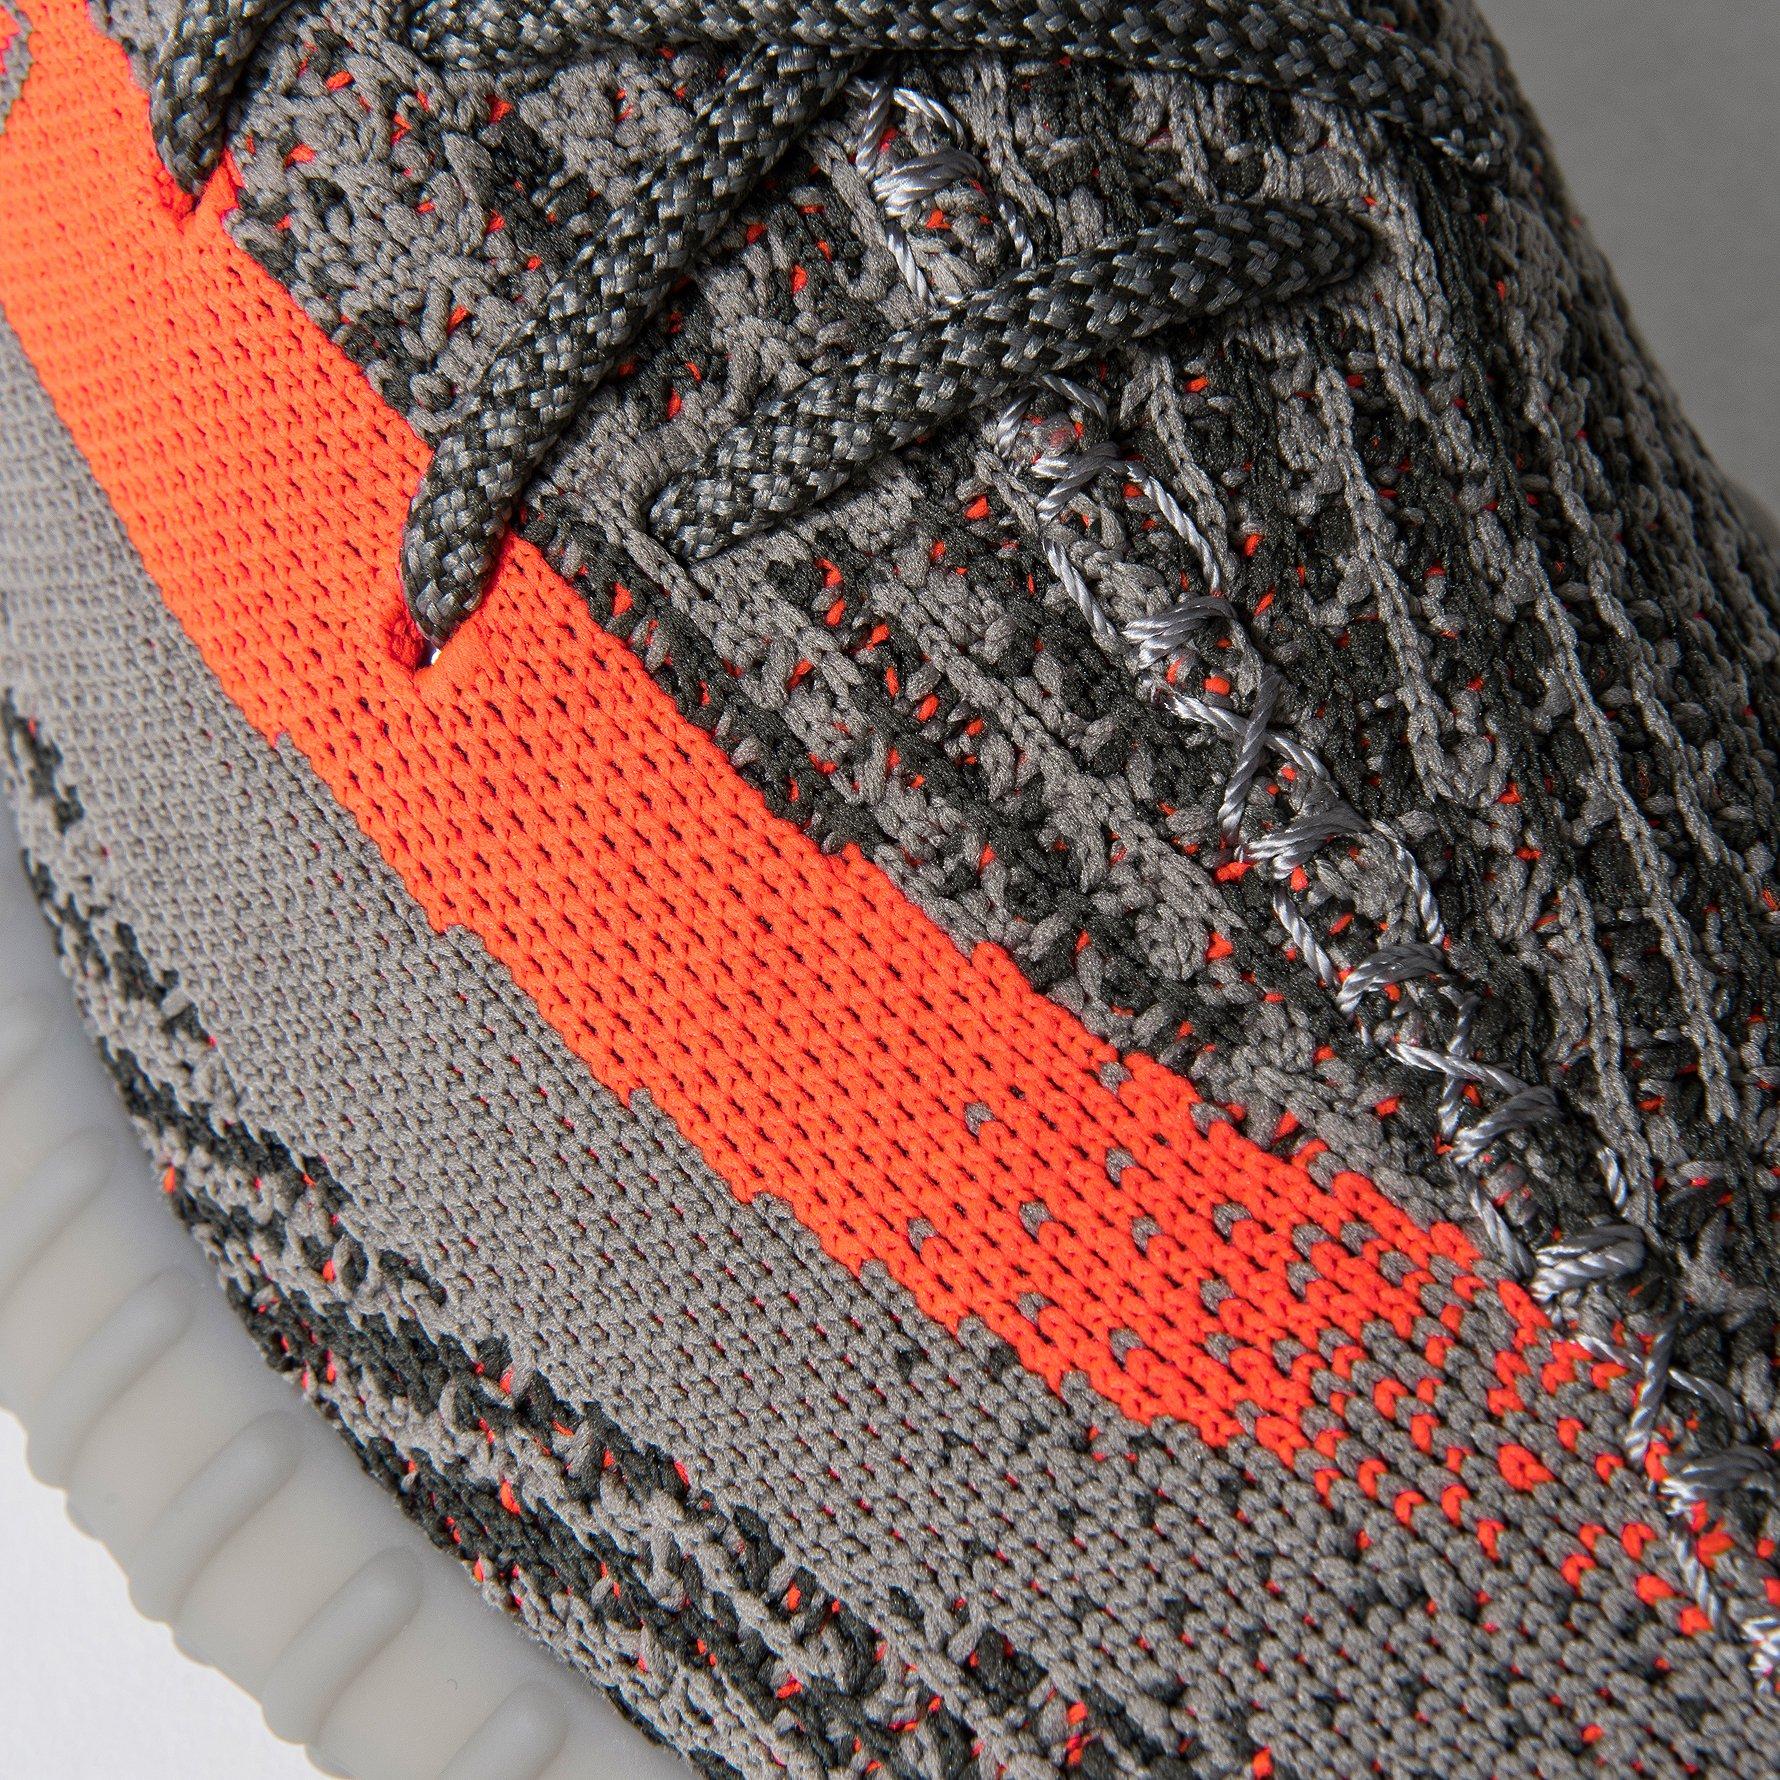 Adidas Yeezy Boost 350 V2 Replica Beluga Grey Orange BB1826